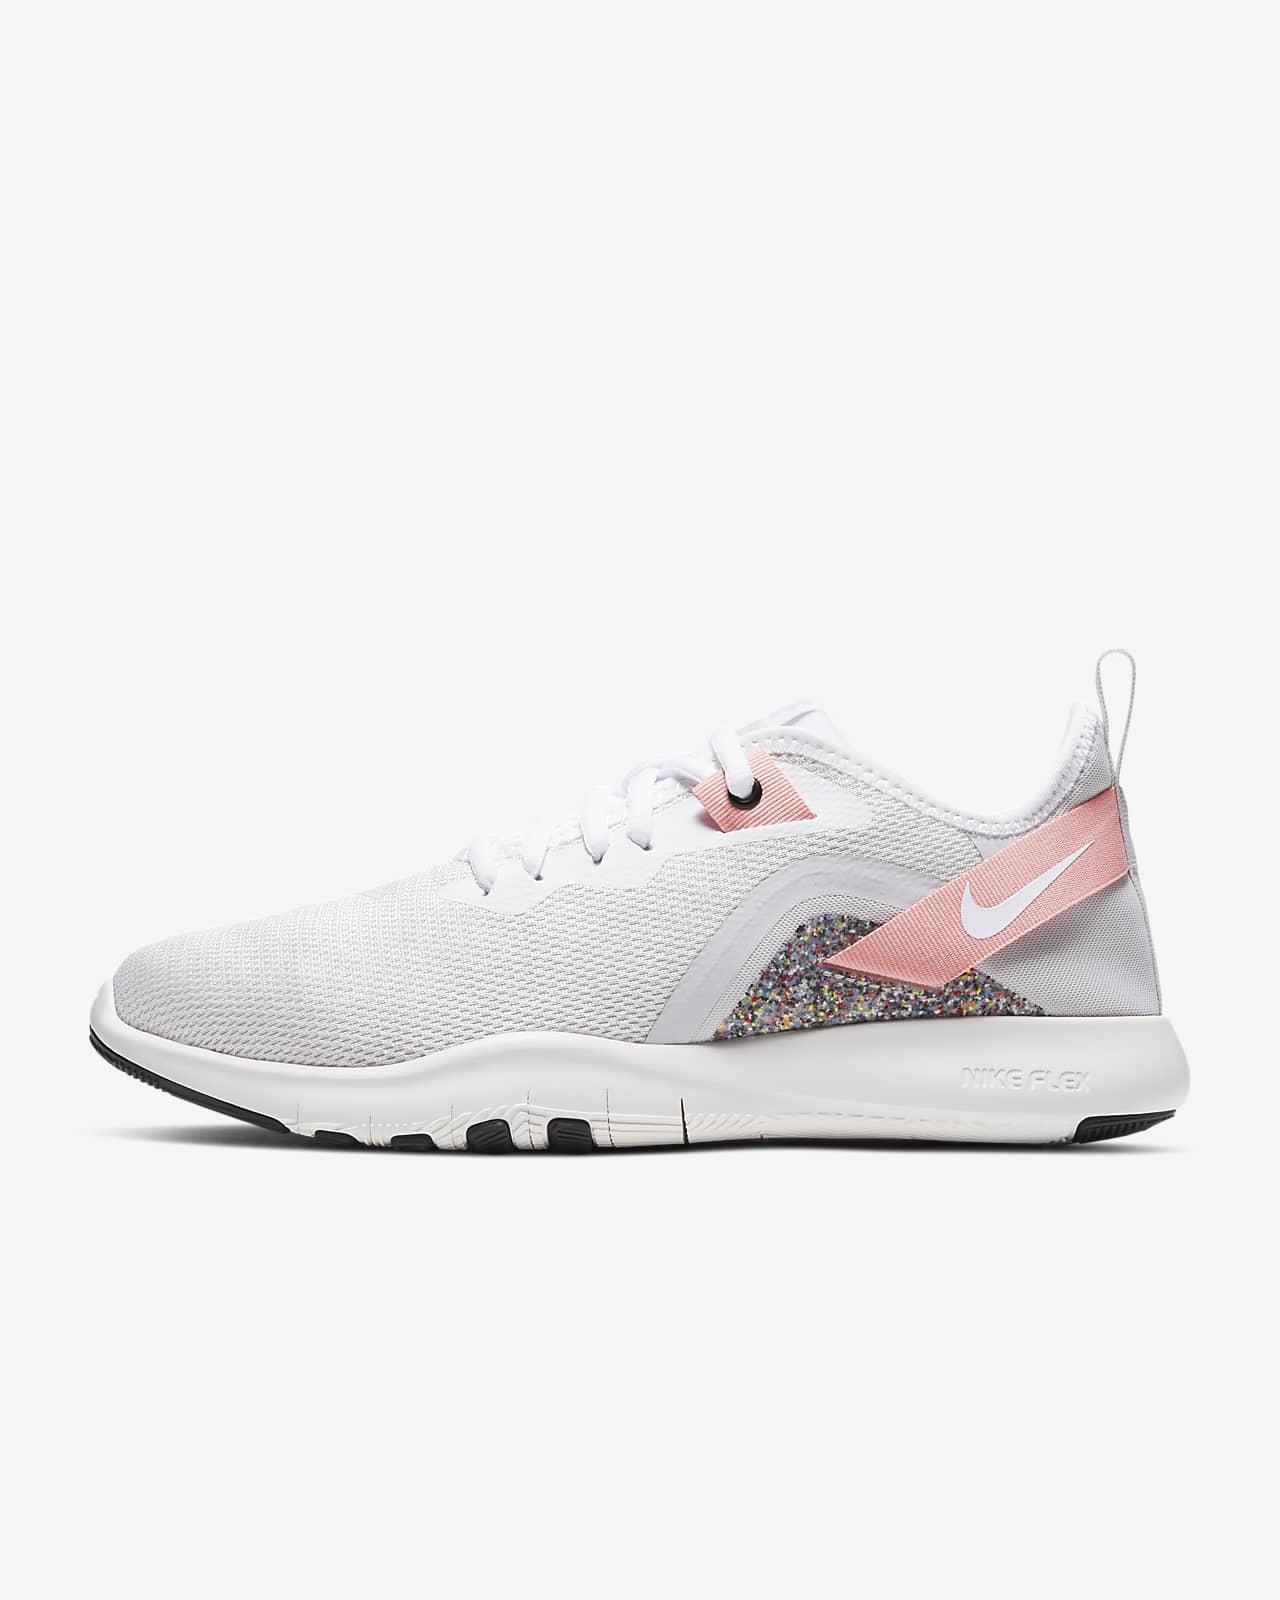 Nike Flex TR 9 Women's Training Shoe